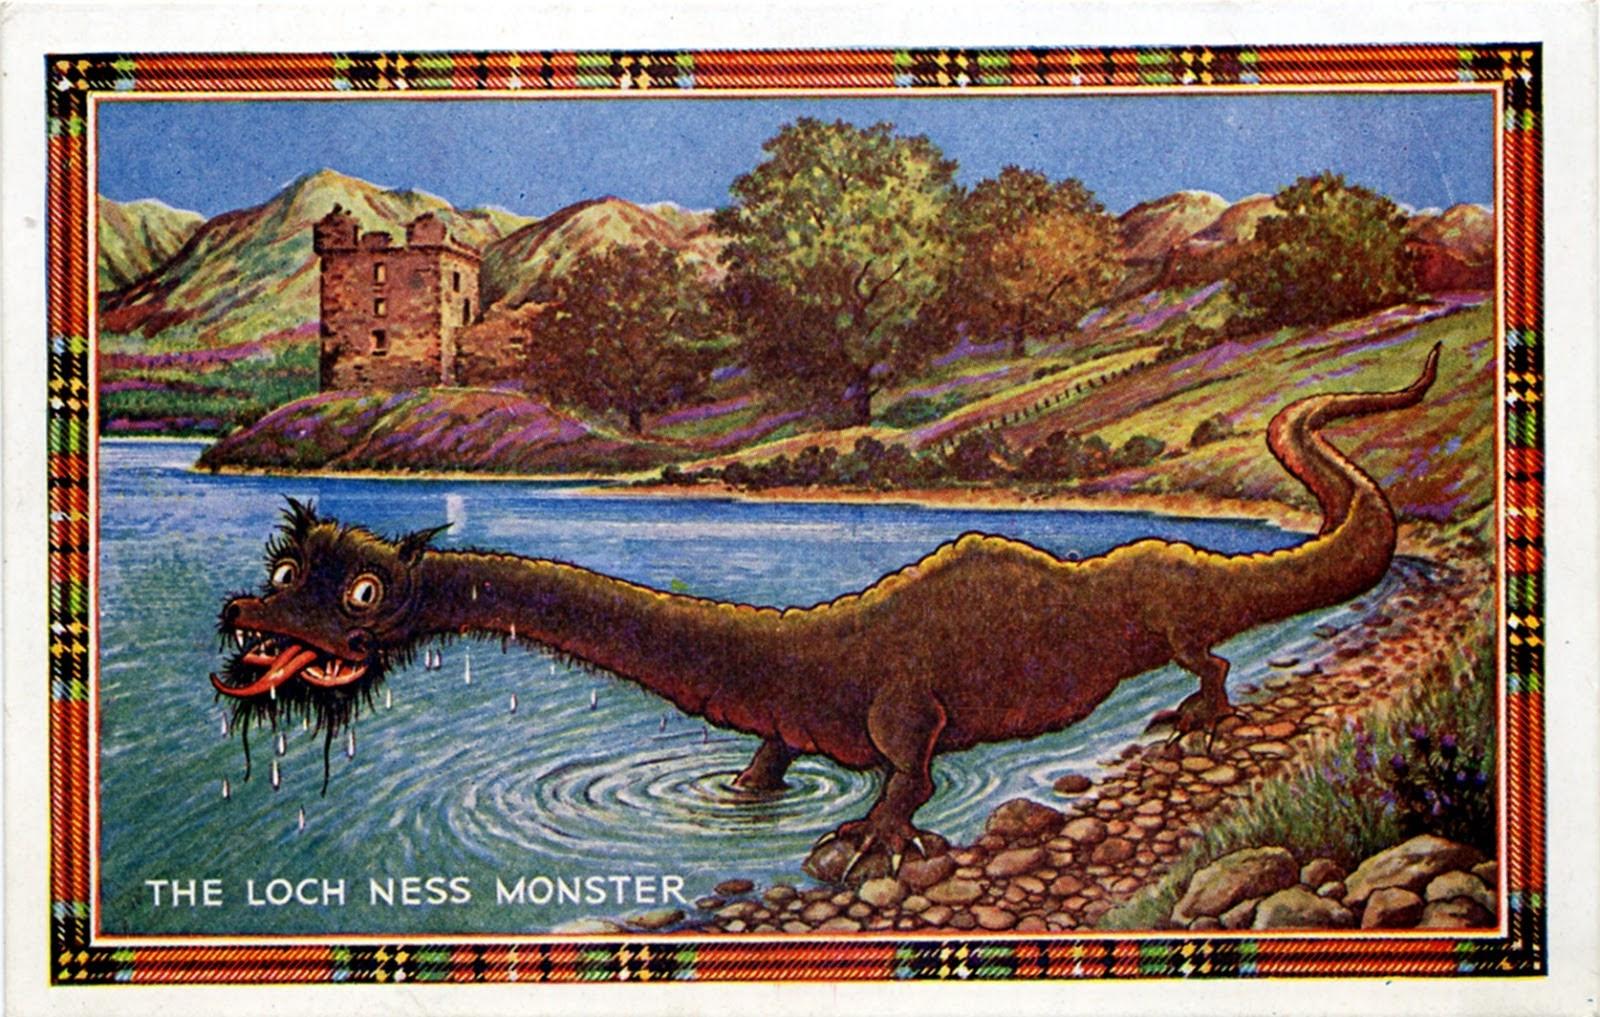 Memories of the Loch Ness Monster